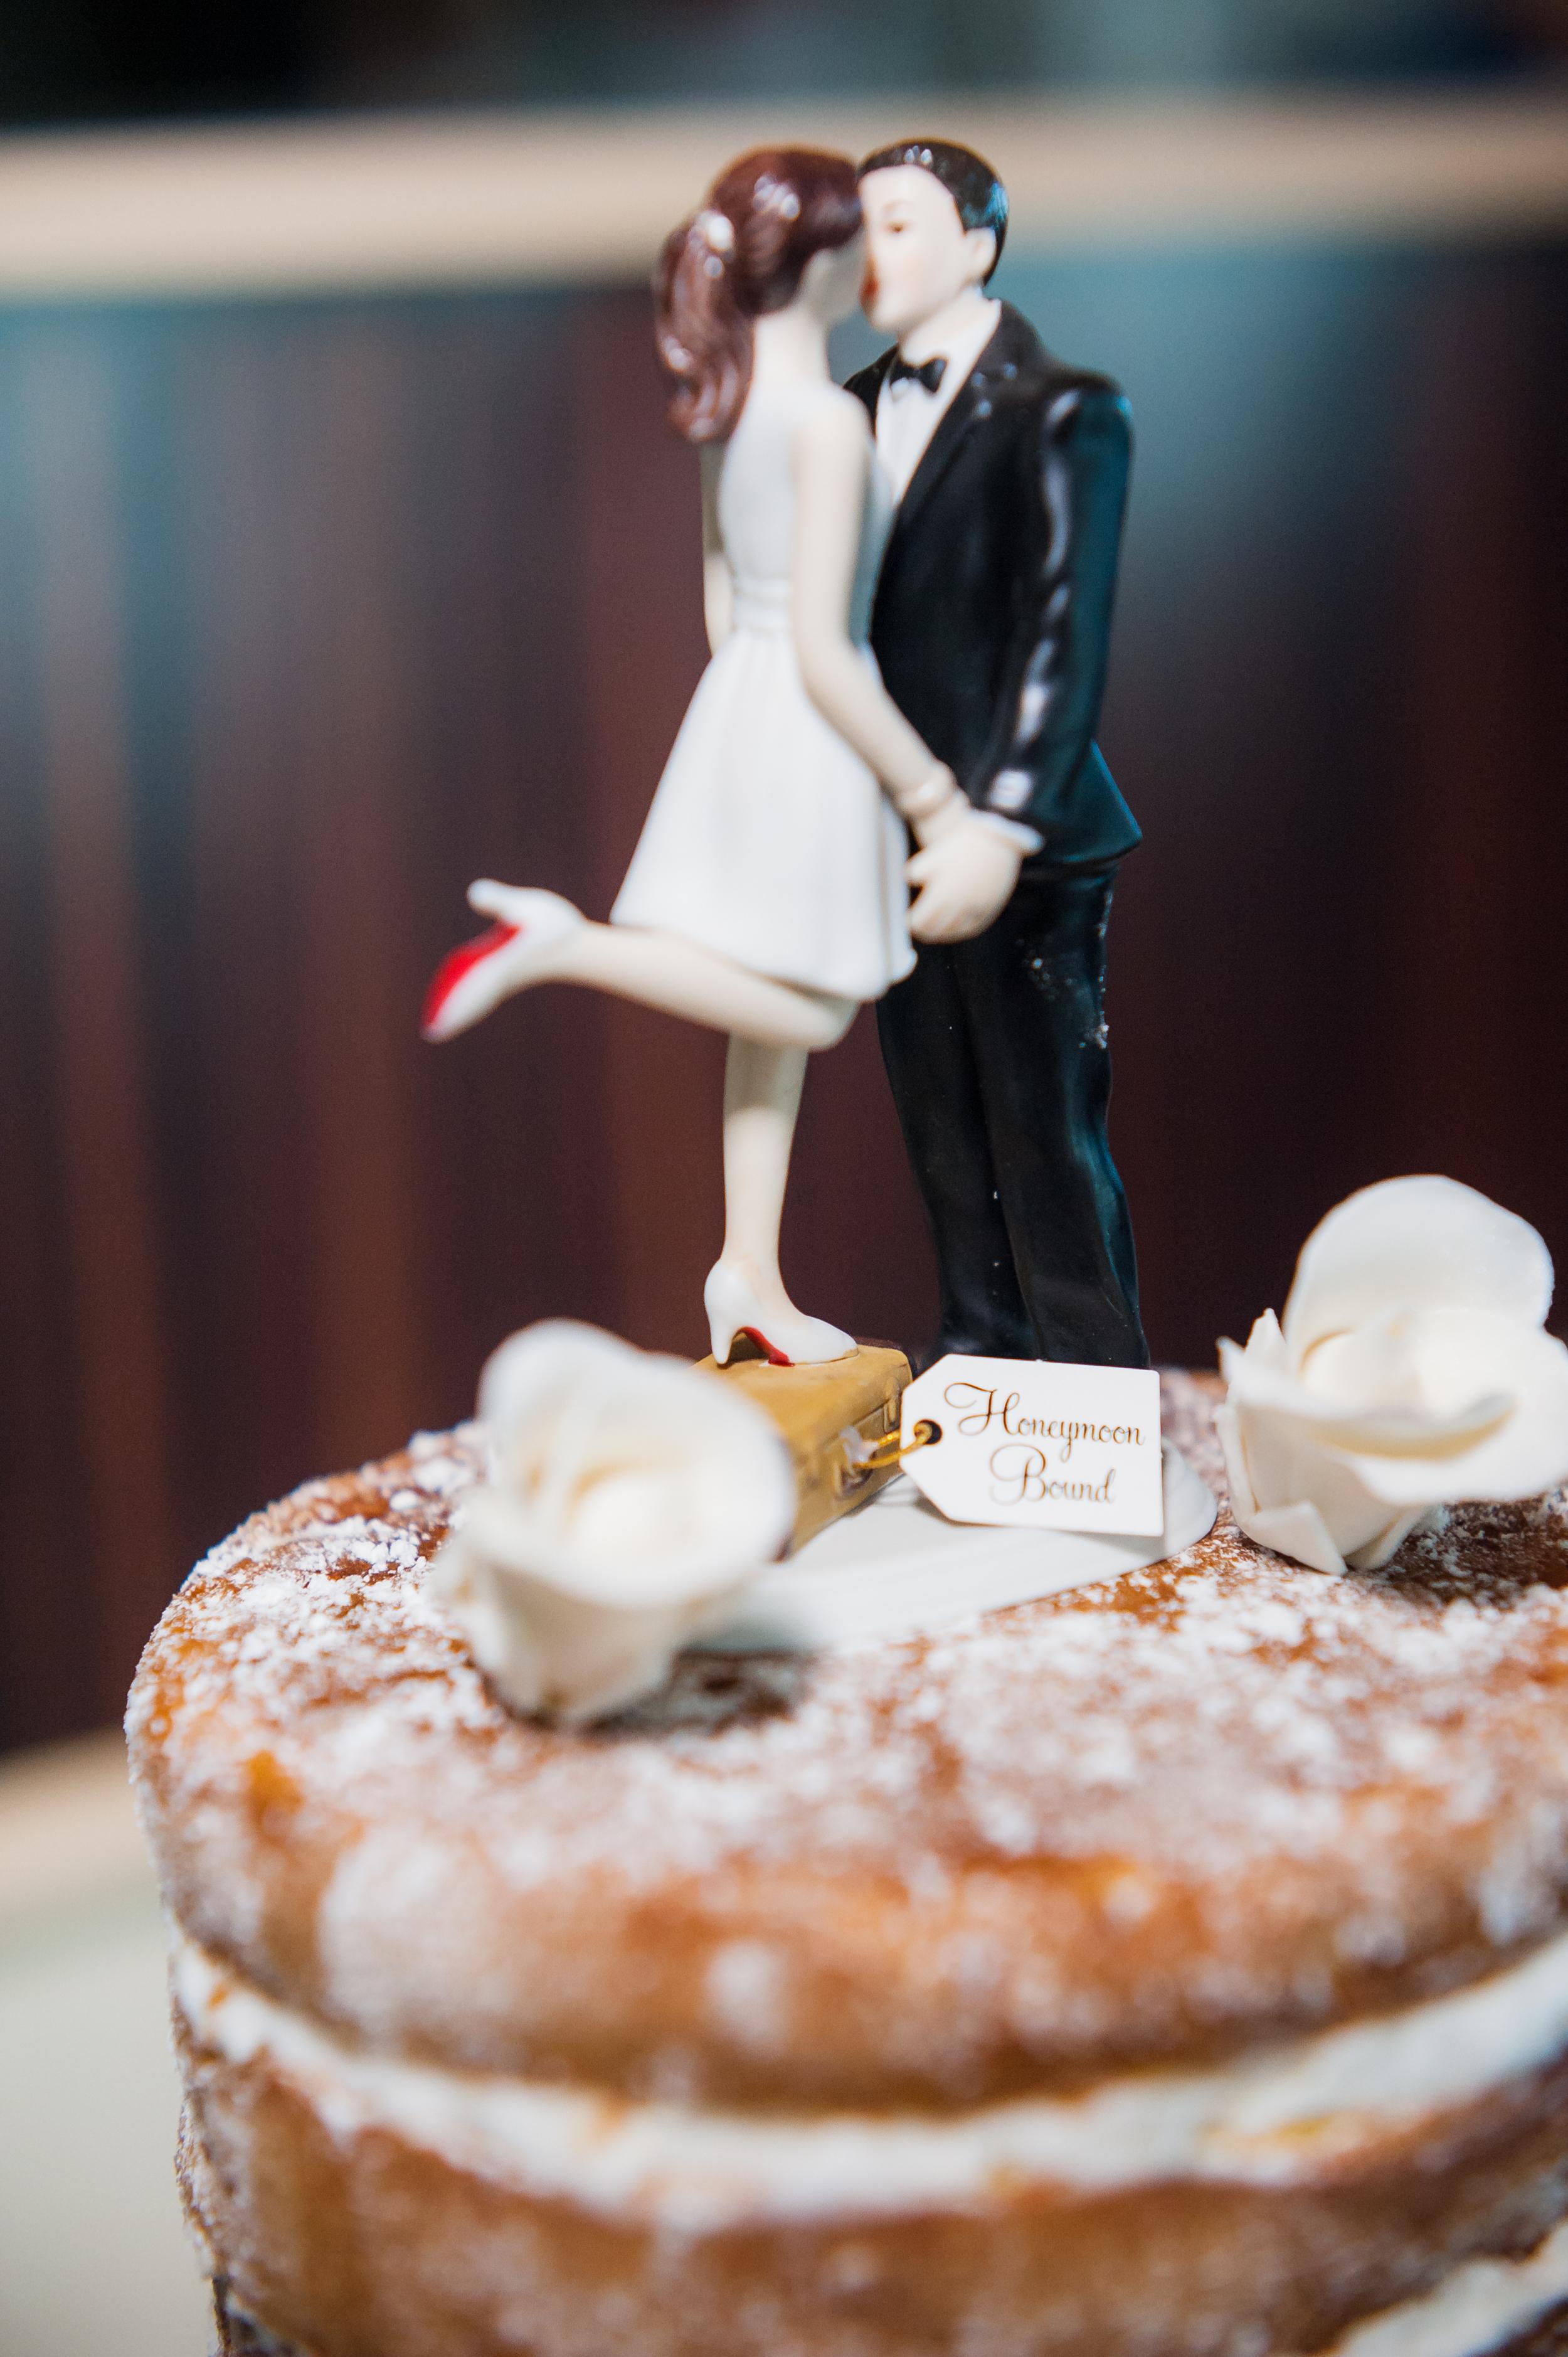 Ottawa-wedding-cake